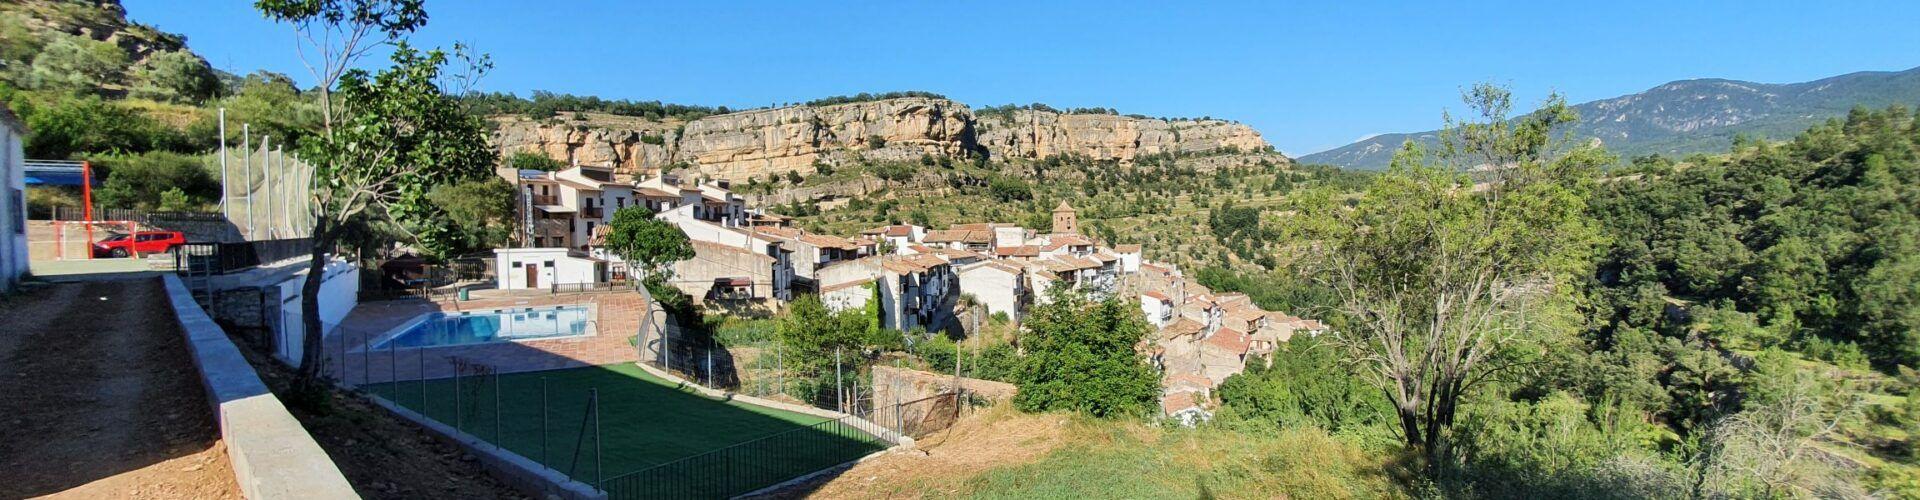 El Parque Natural de la Tinença de Benifassà: paraíso para la flora y fauna